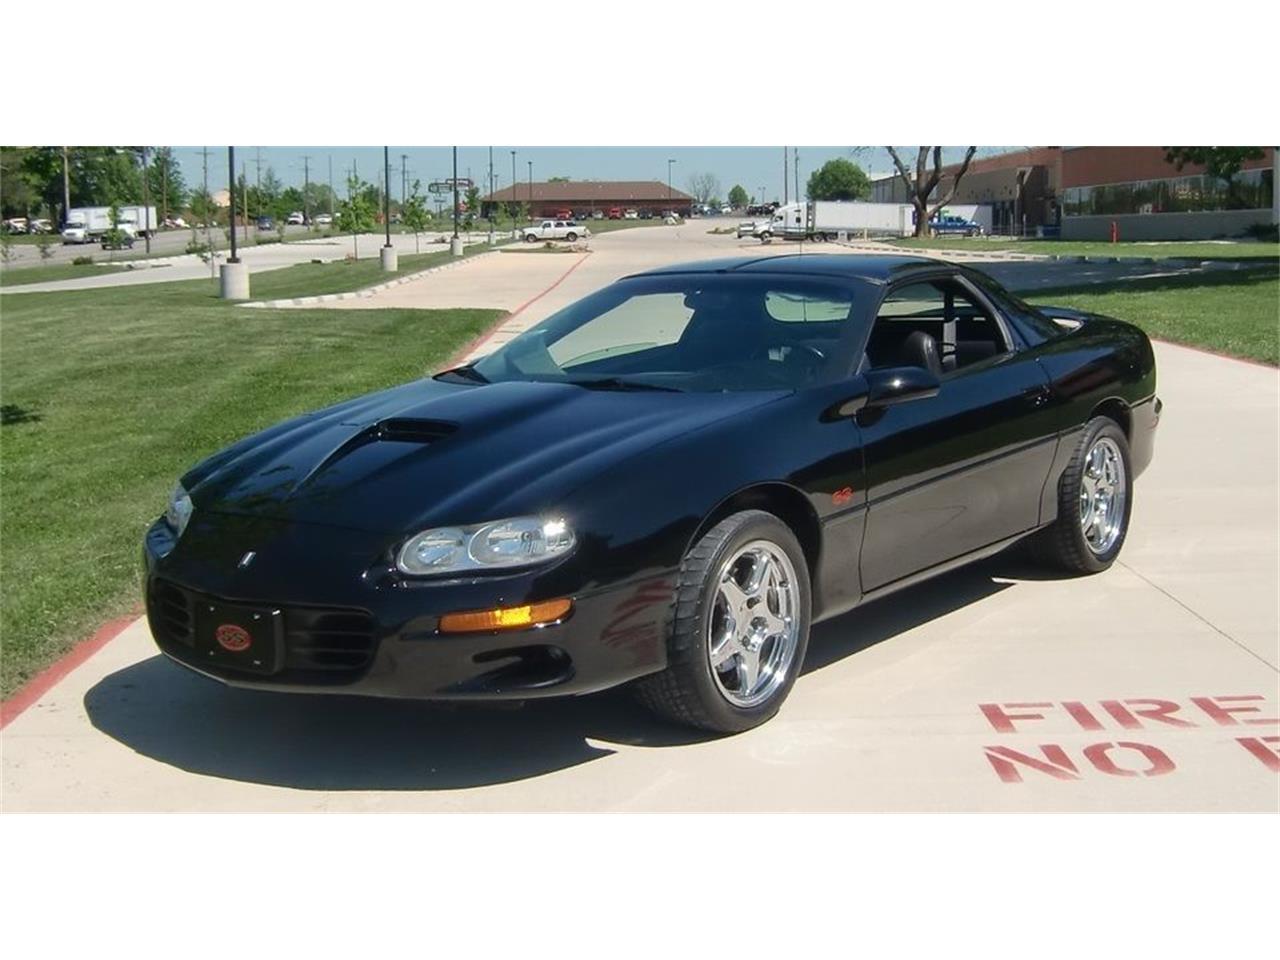 2002 Chevrolet Camaro (CC-1049578) for sale in Springfield, Missouri